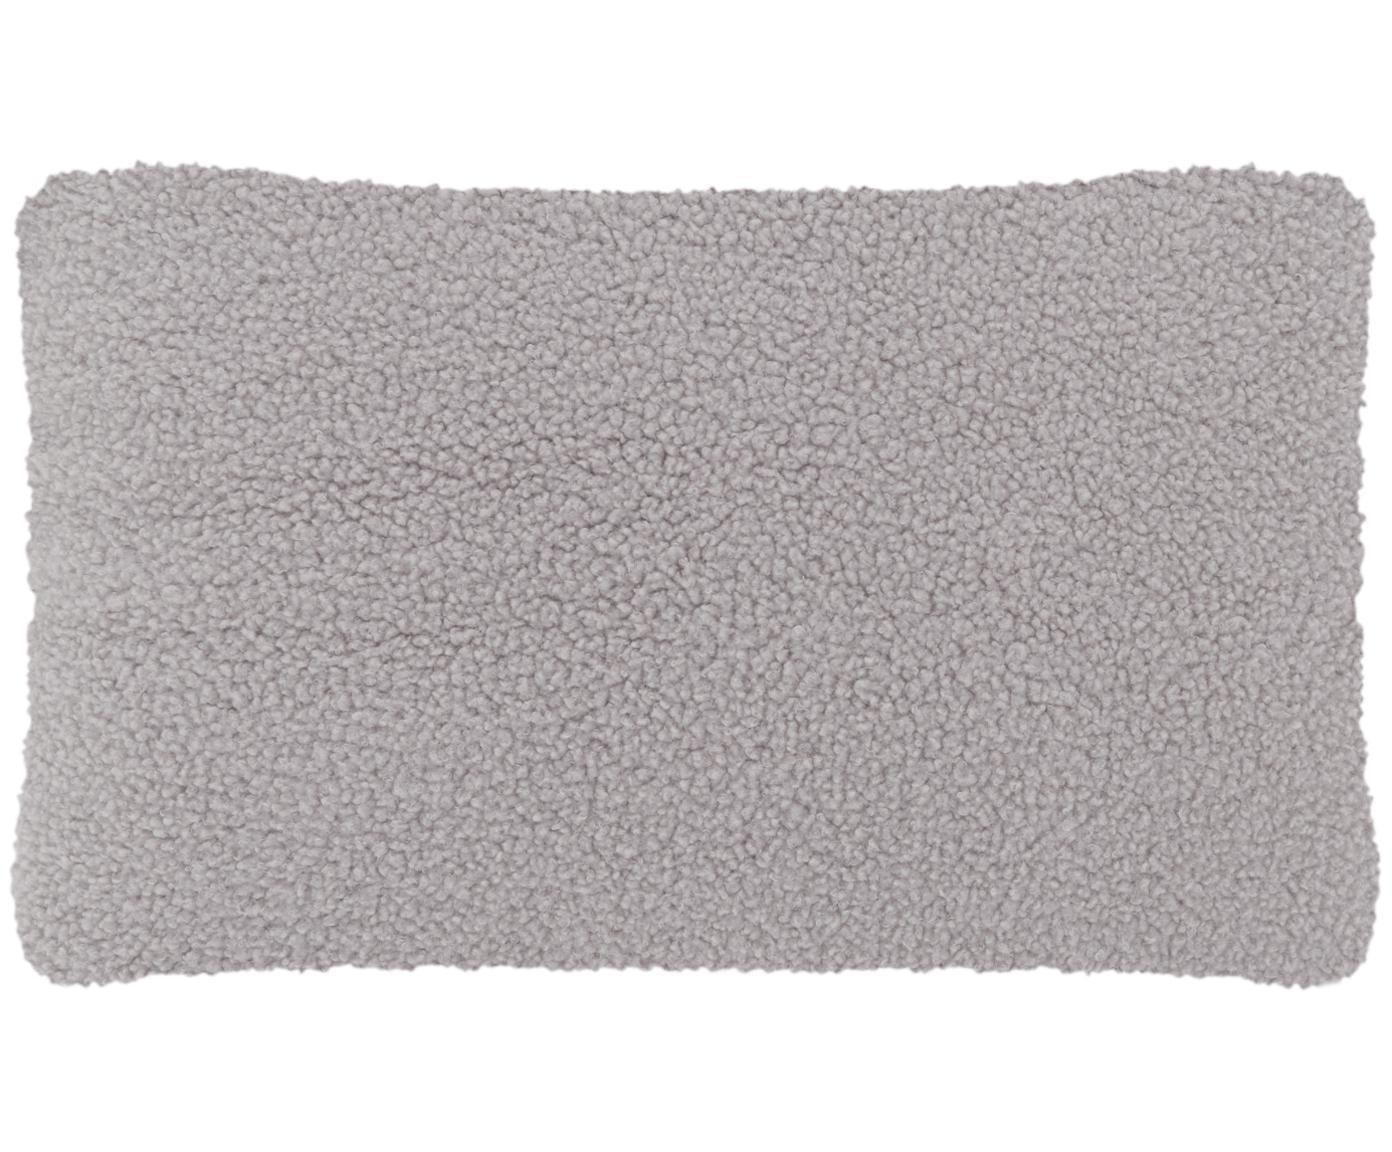 Teddy-kussenhoes Mille, Lichtgrijs, 30 x 50 cm